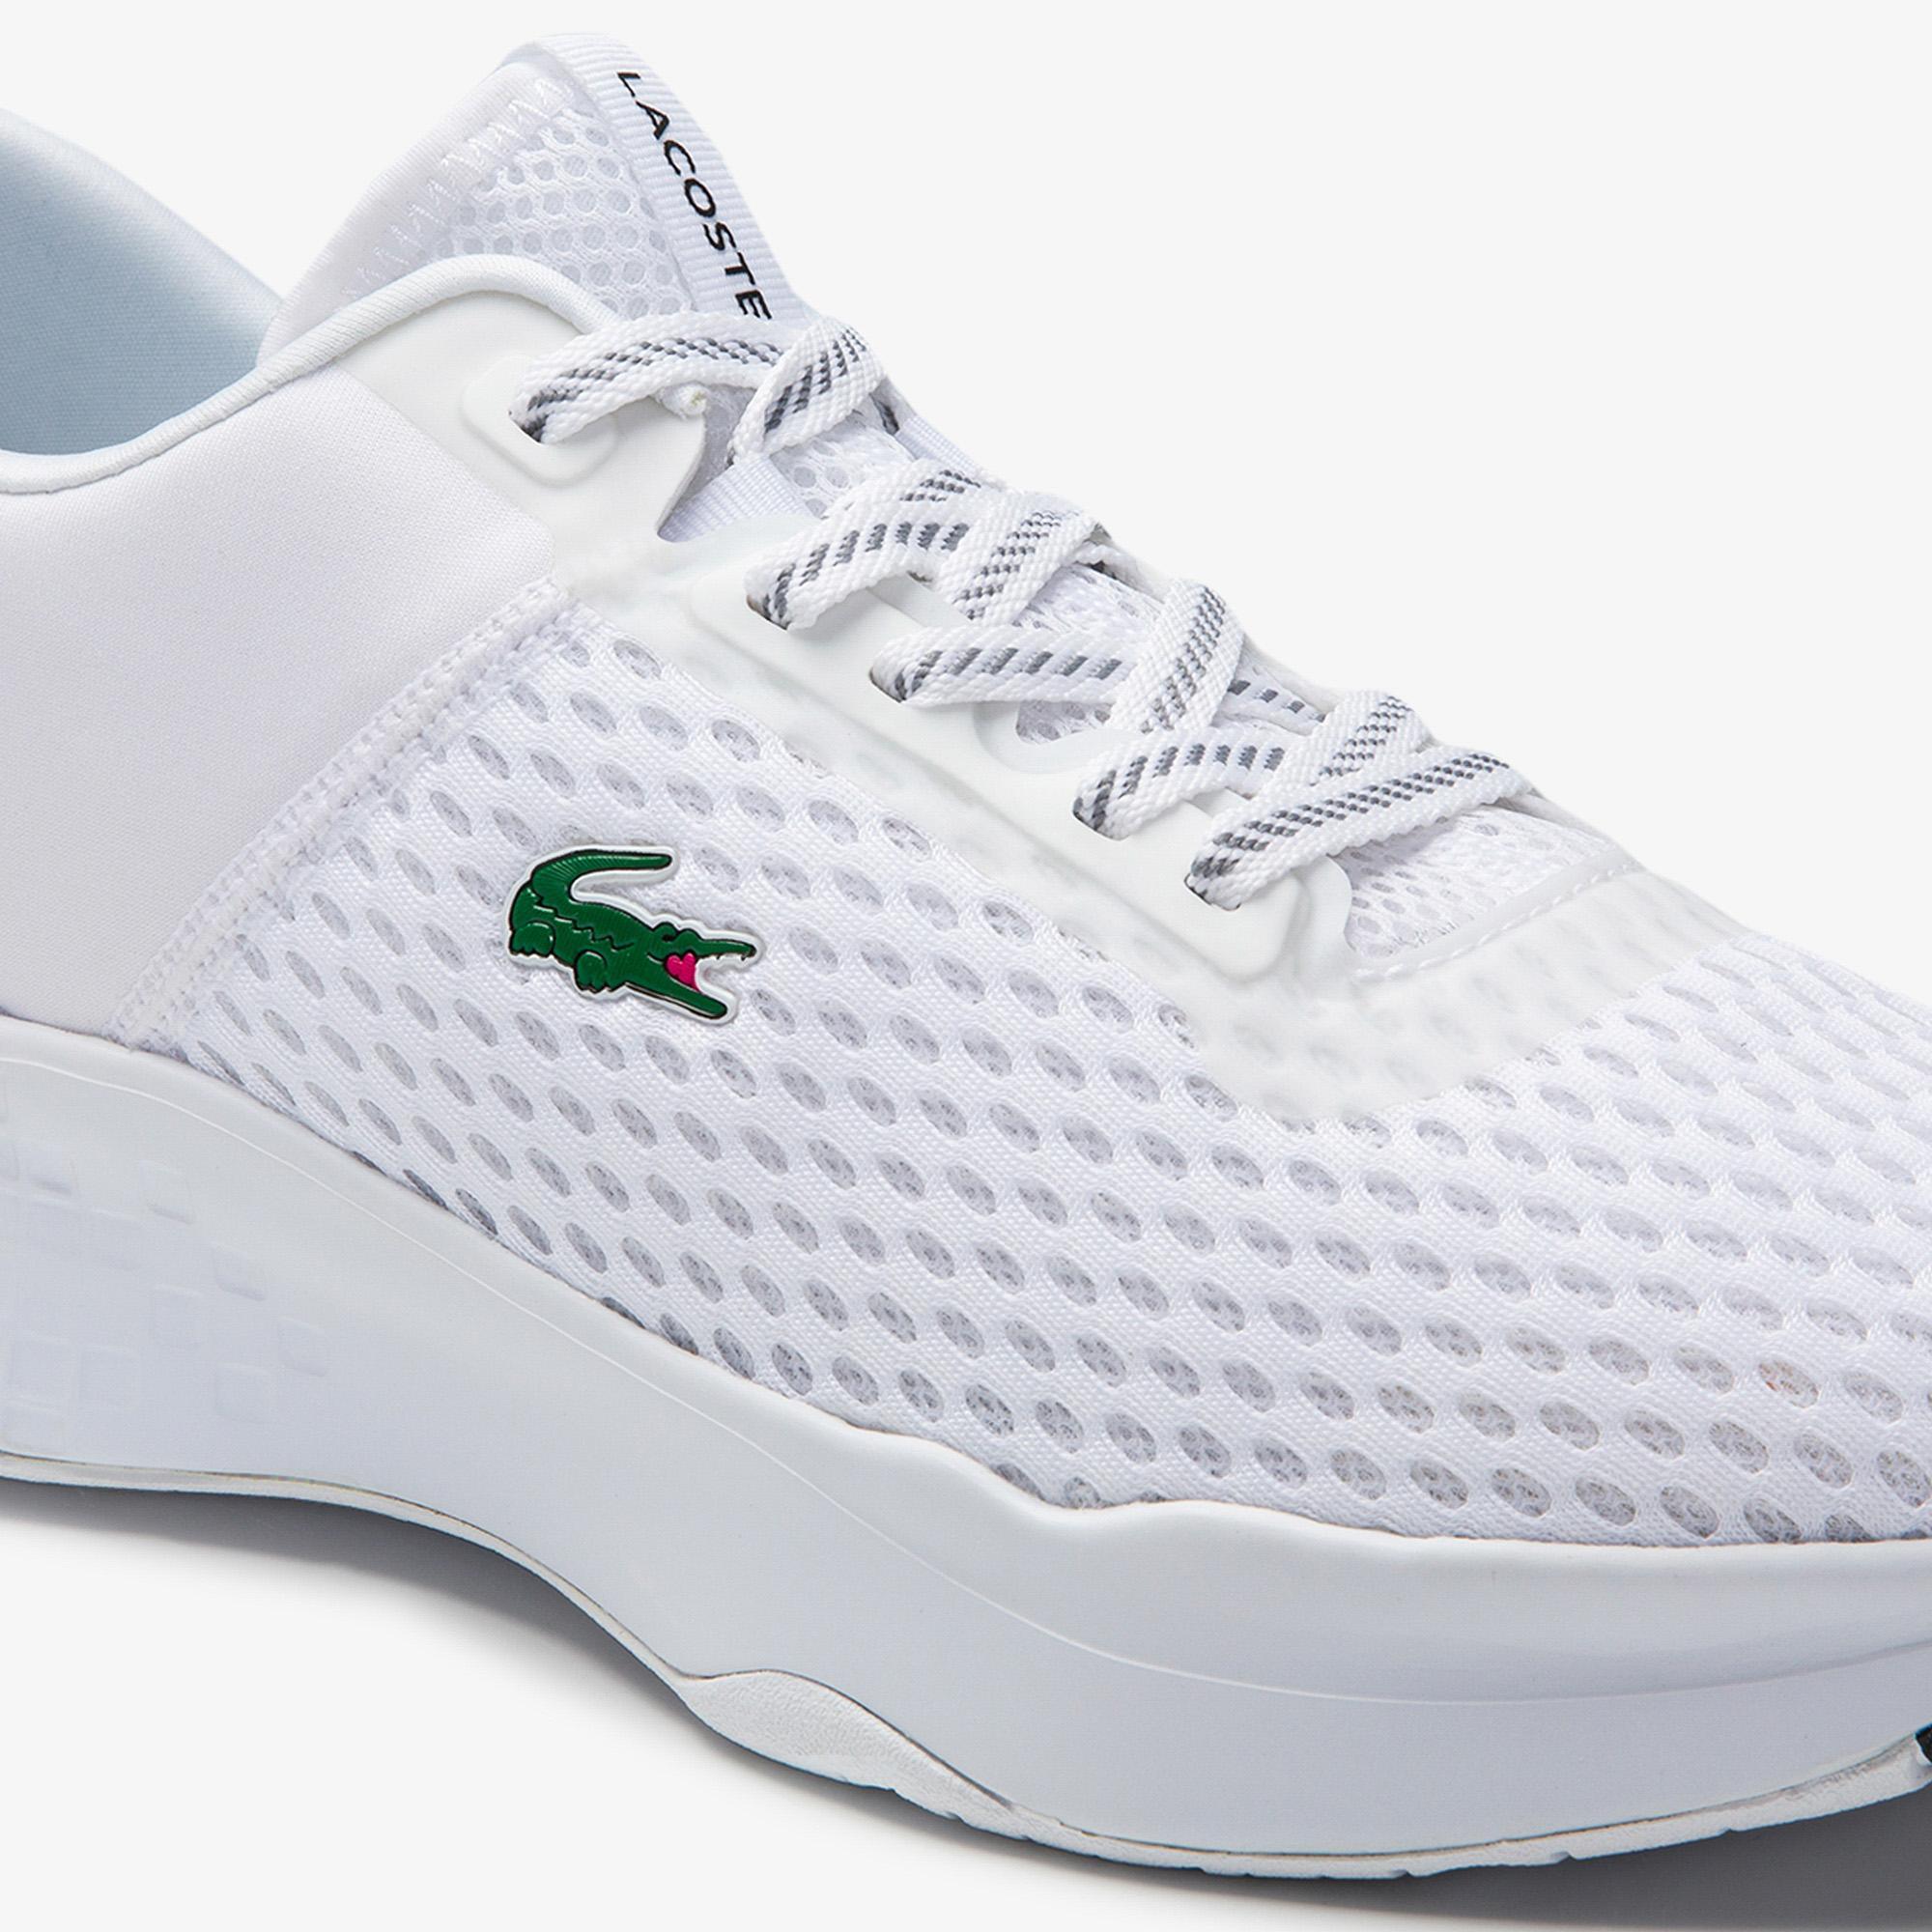 Lacoste Court-Drive 0120 1 Sma Erkek Beyaz - Siyah Sneaker